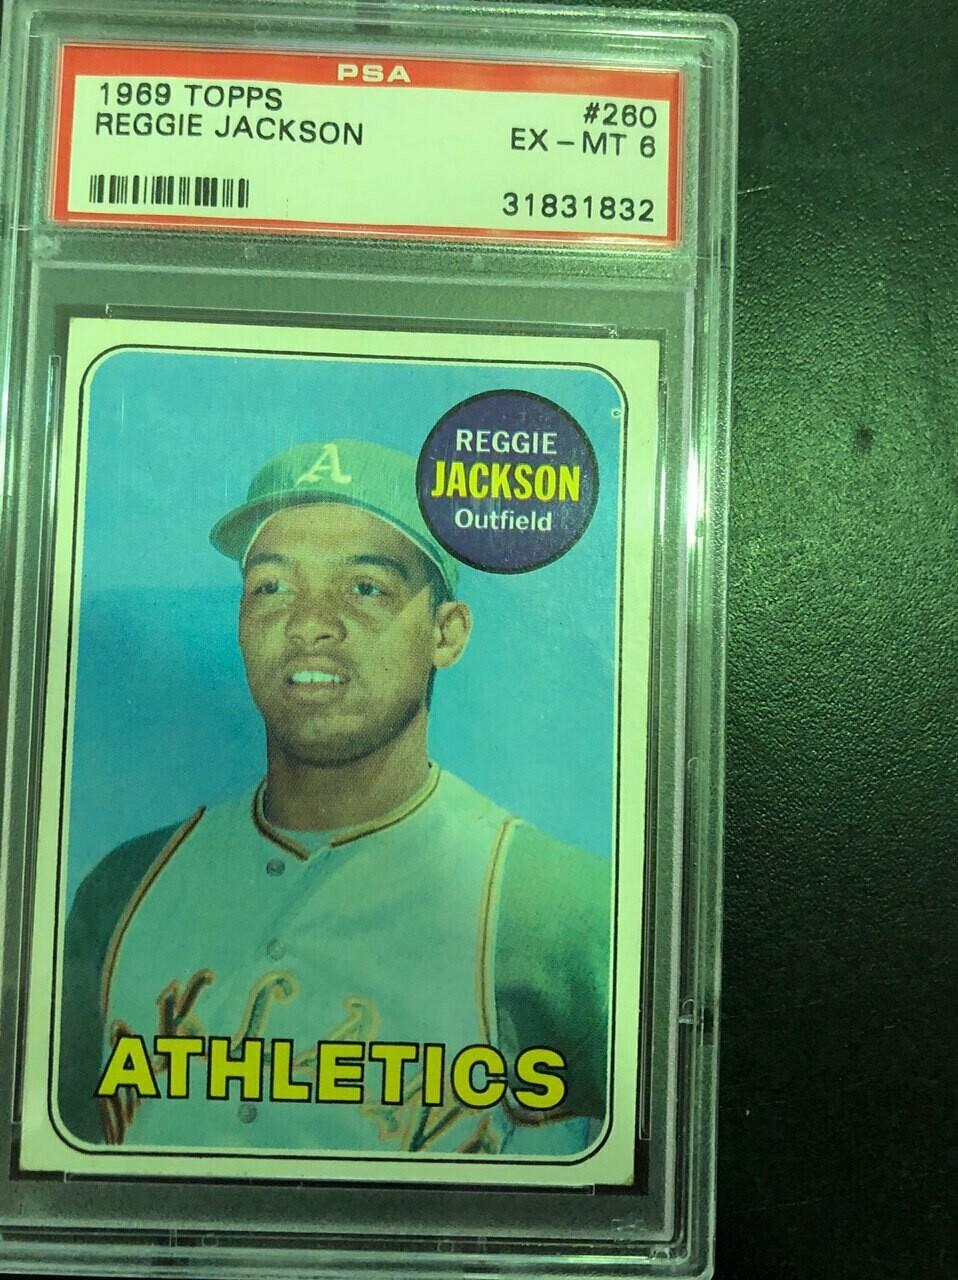 1969 Topps #260 Reggie Jackson rookie PSA graded 6, $250